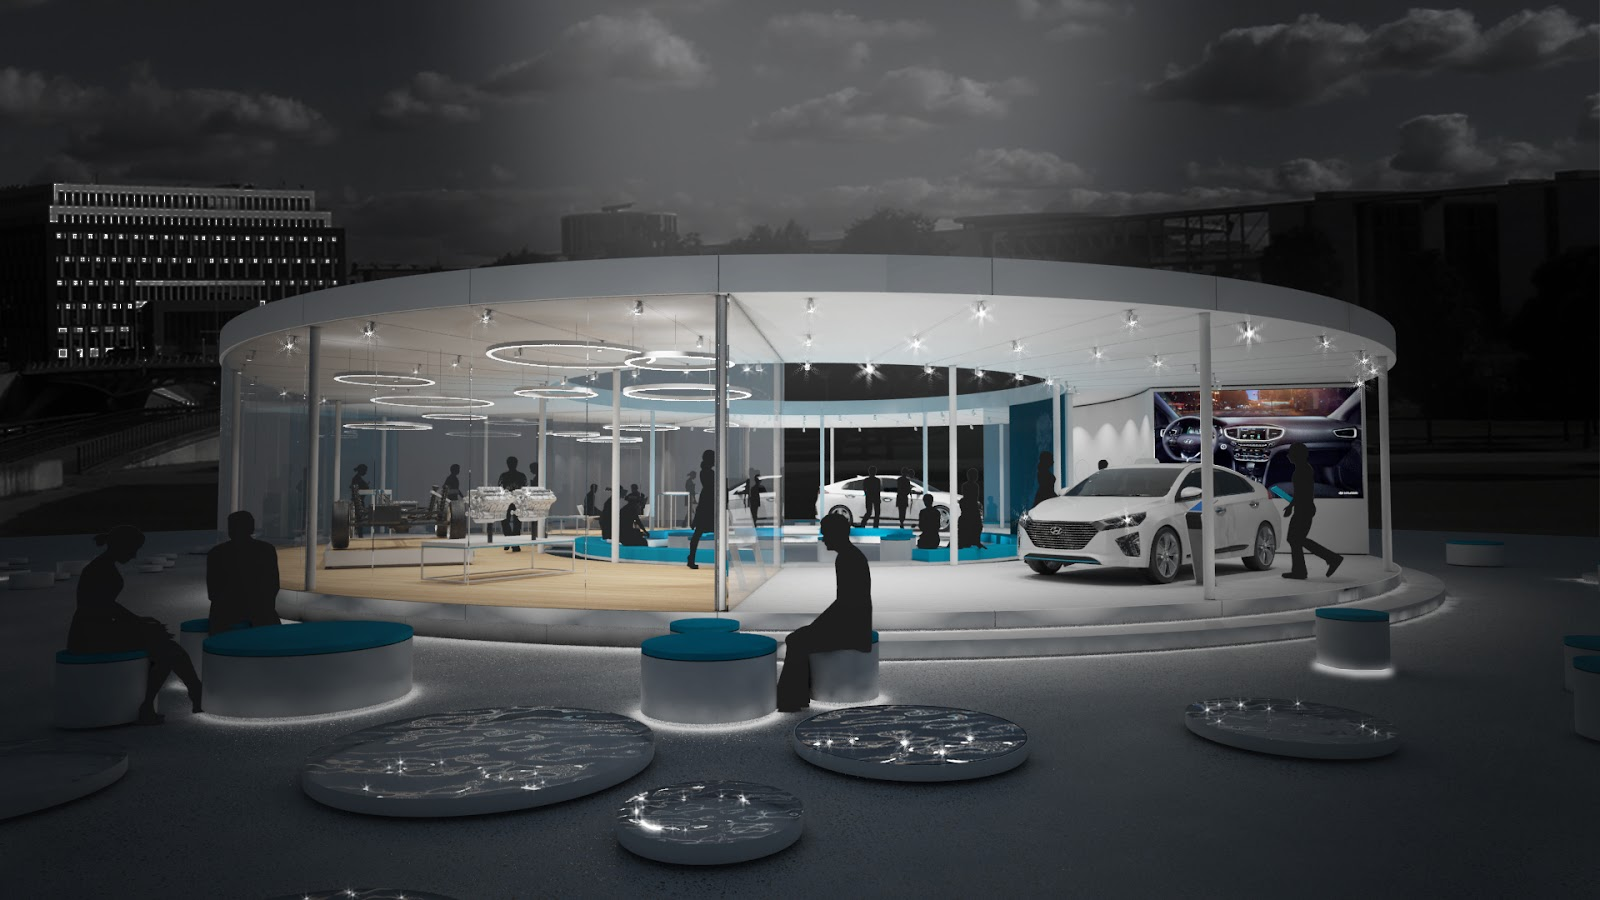 generation ioniq lounge at night H Hyundai Motor εγκαινιάζει το Generation IONIQ Tour στη Γερμανία car, Electric cars, Hyundai, Hyundai IONIQ, Hyundai Ελλάς